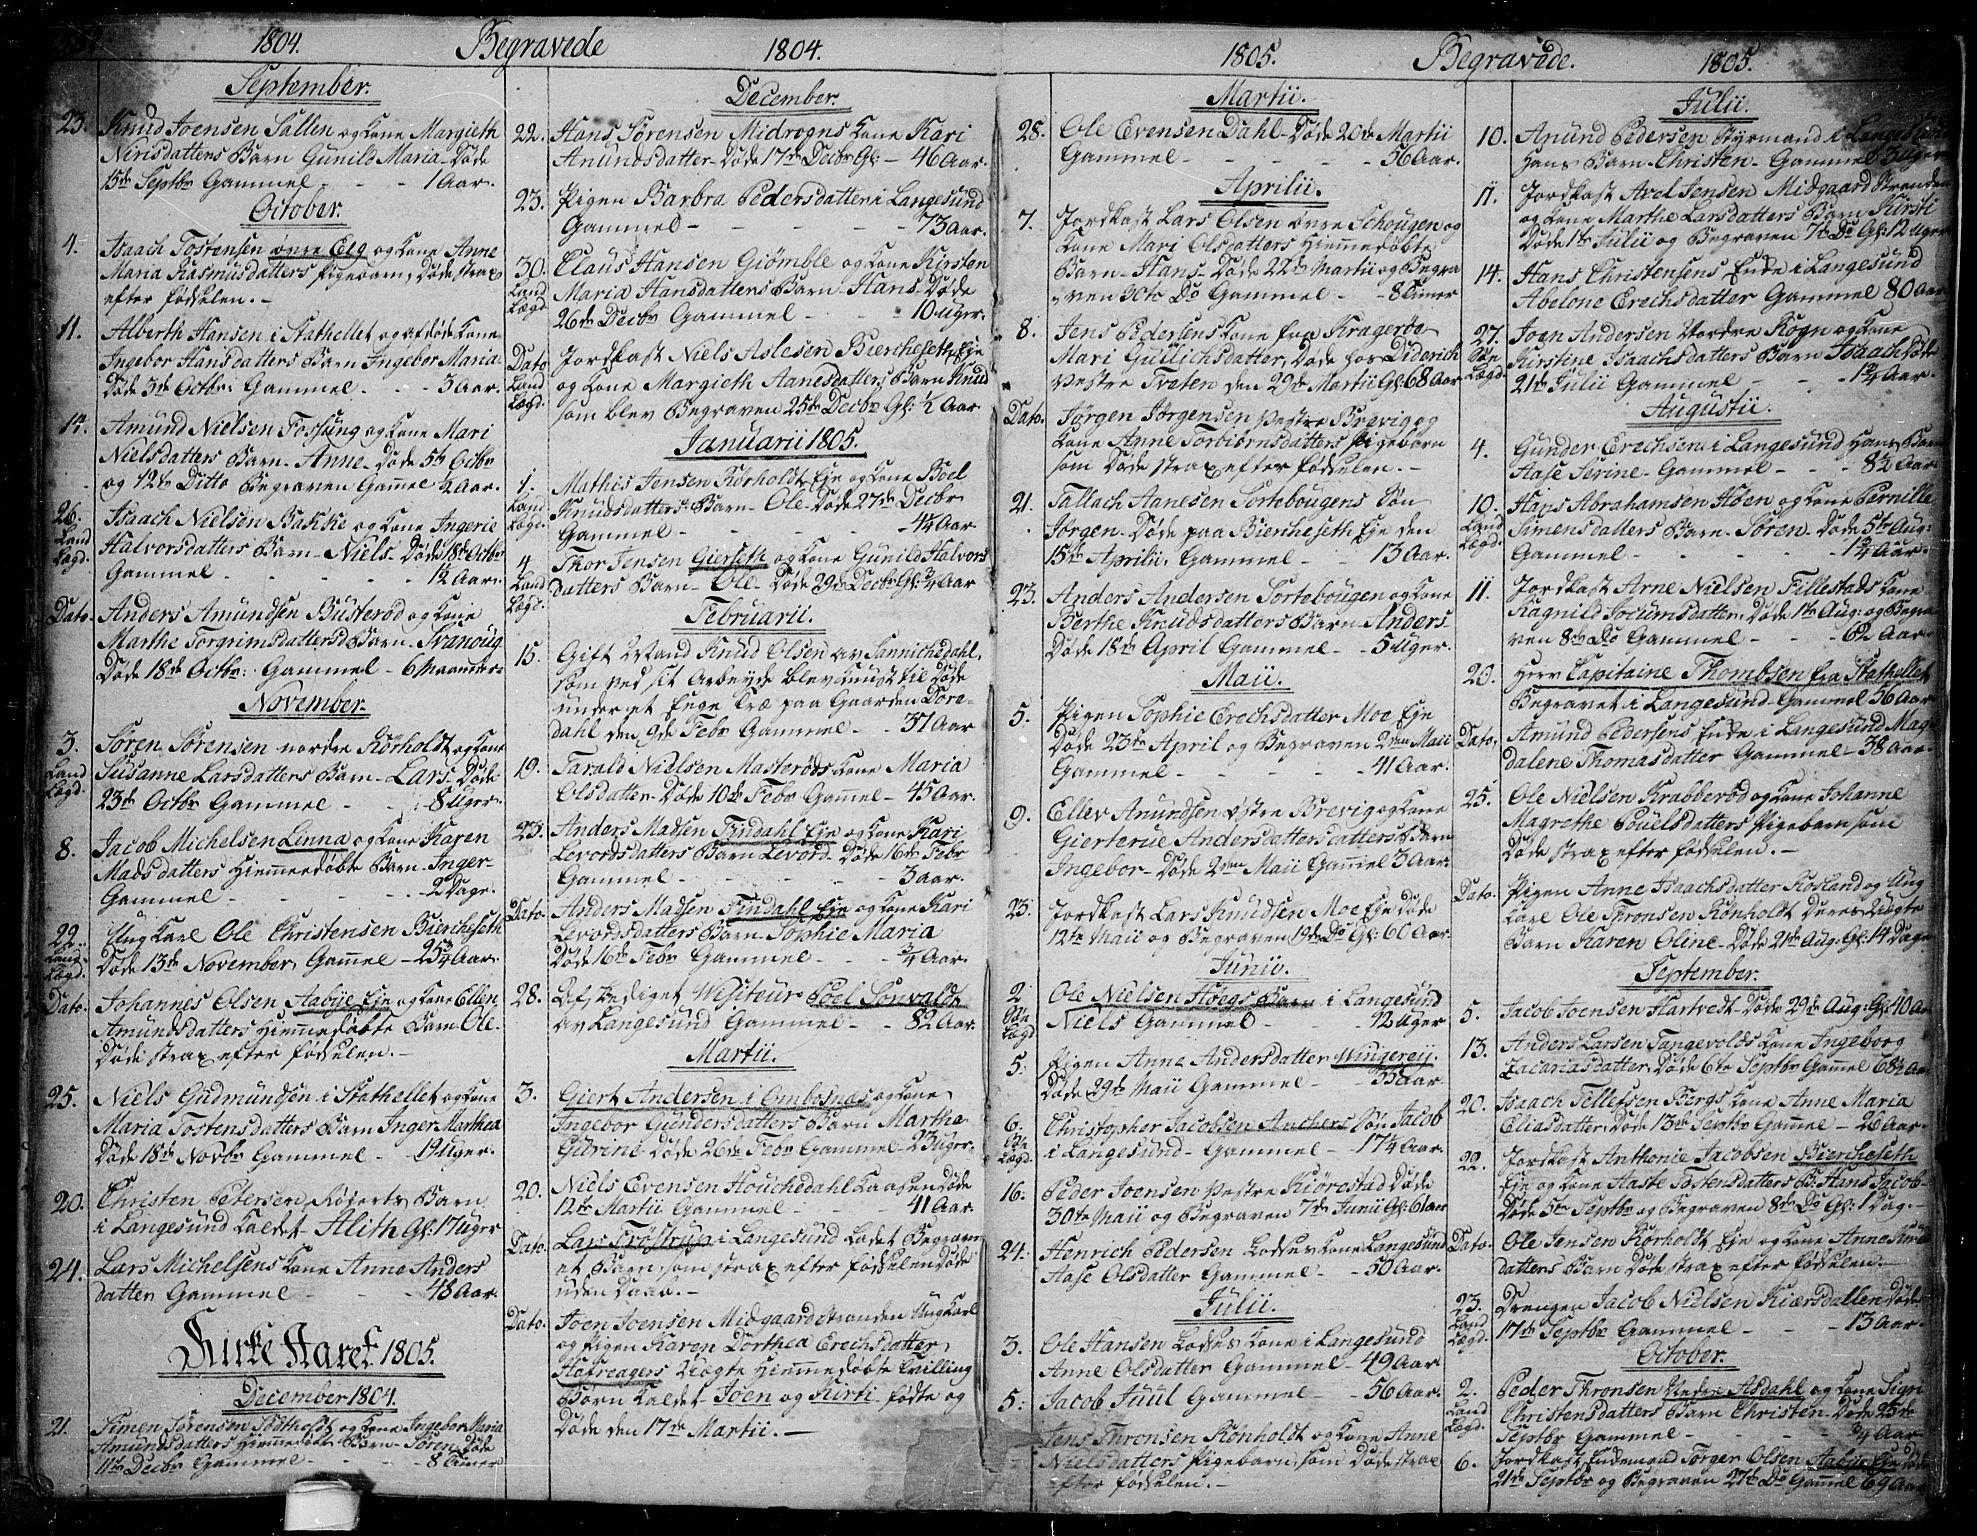 SAKO, Bamble kirkebøker, F/Fa/L0002: Ministerialbok nr. I 2, 1775-1814, s. 552-553